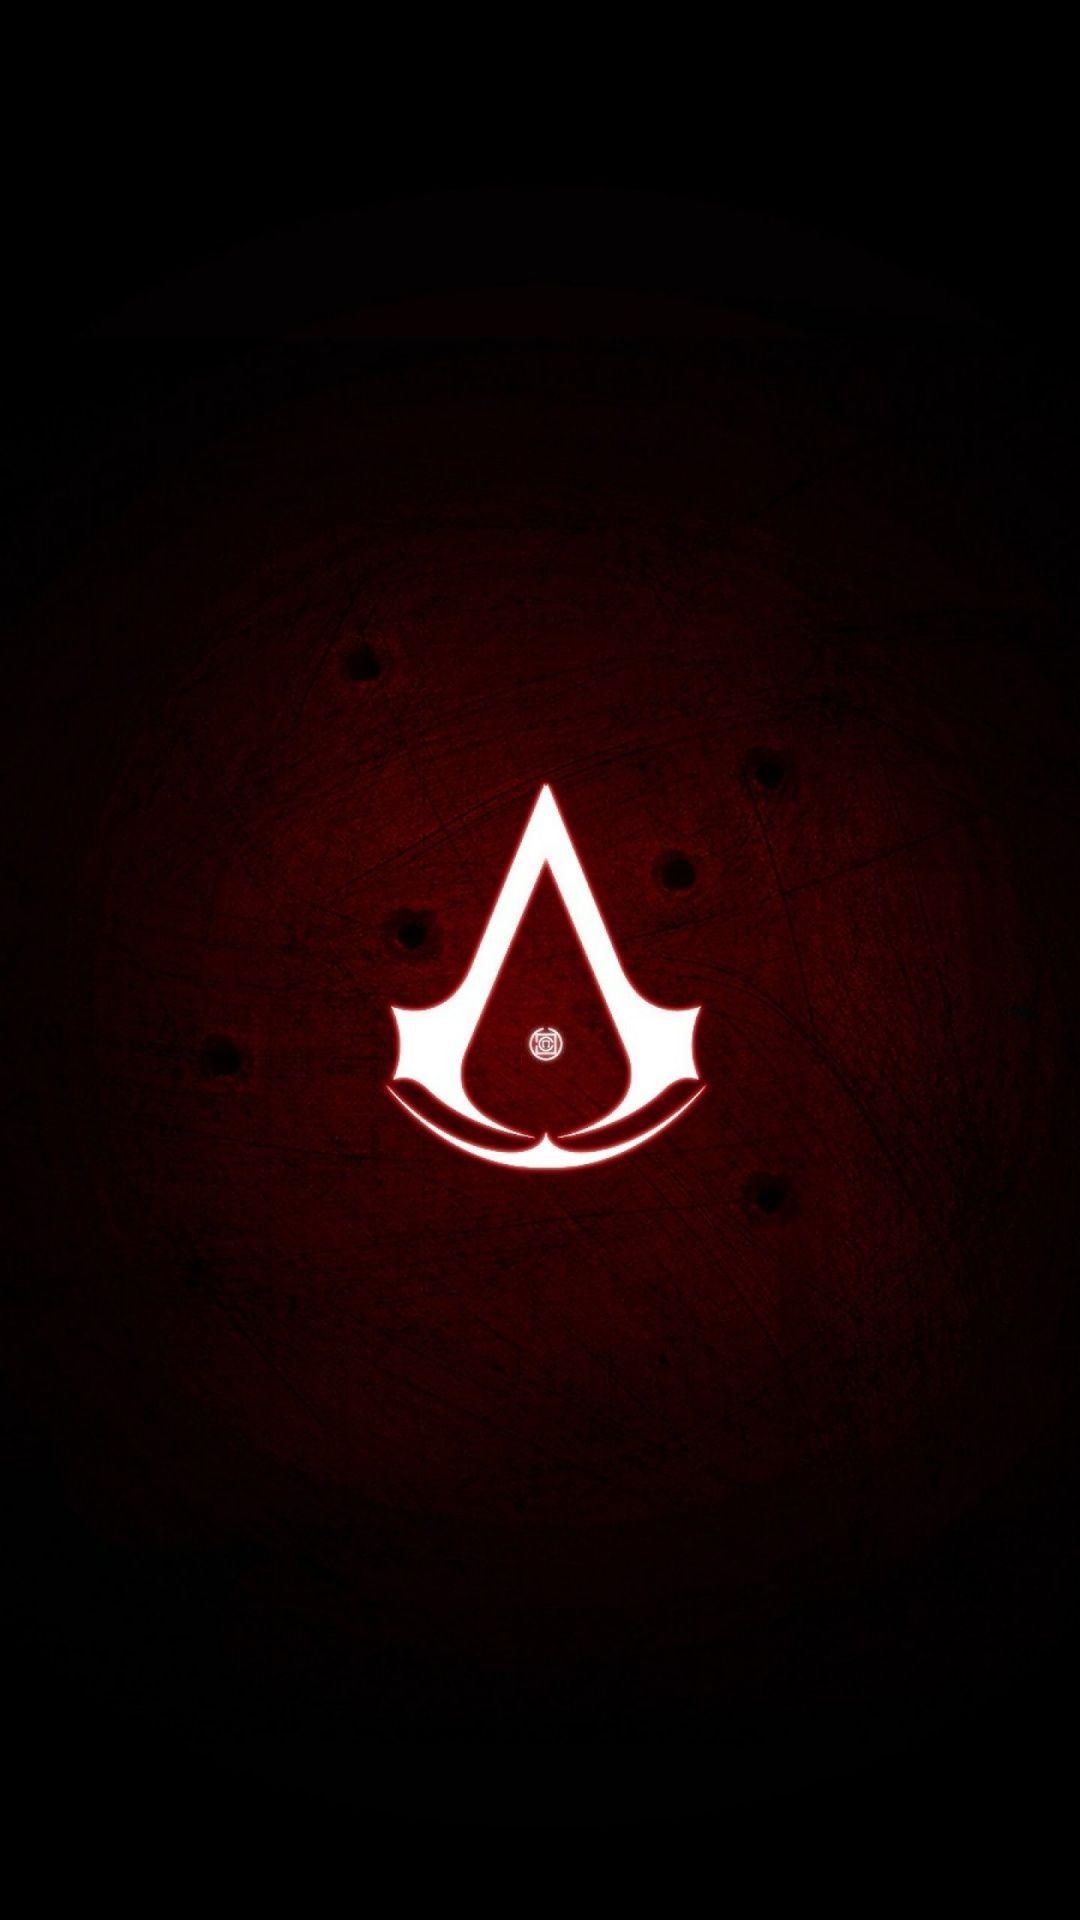 Amoled Wallpaper 27 Assassin S Creed Wallpaper Iphone Wallpaper